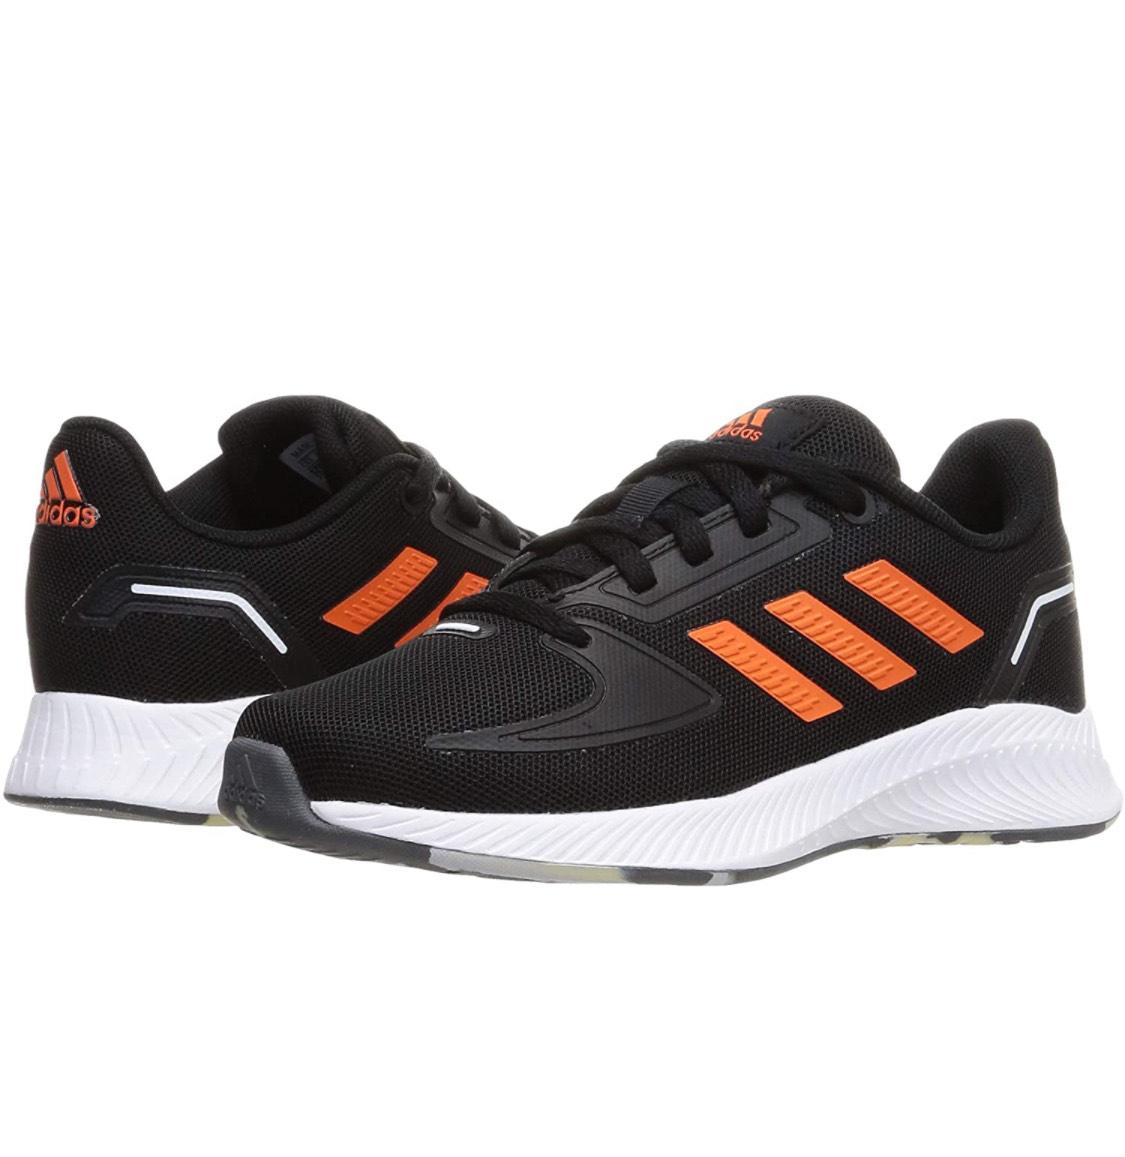 Zapatillas running Adidas Runfalcon 2.0 K talla 38 2/3 (niños unisex)